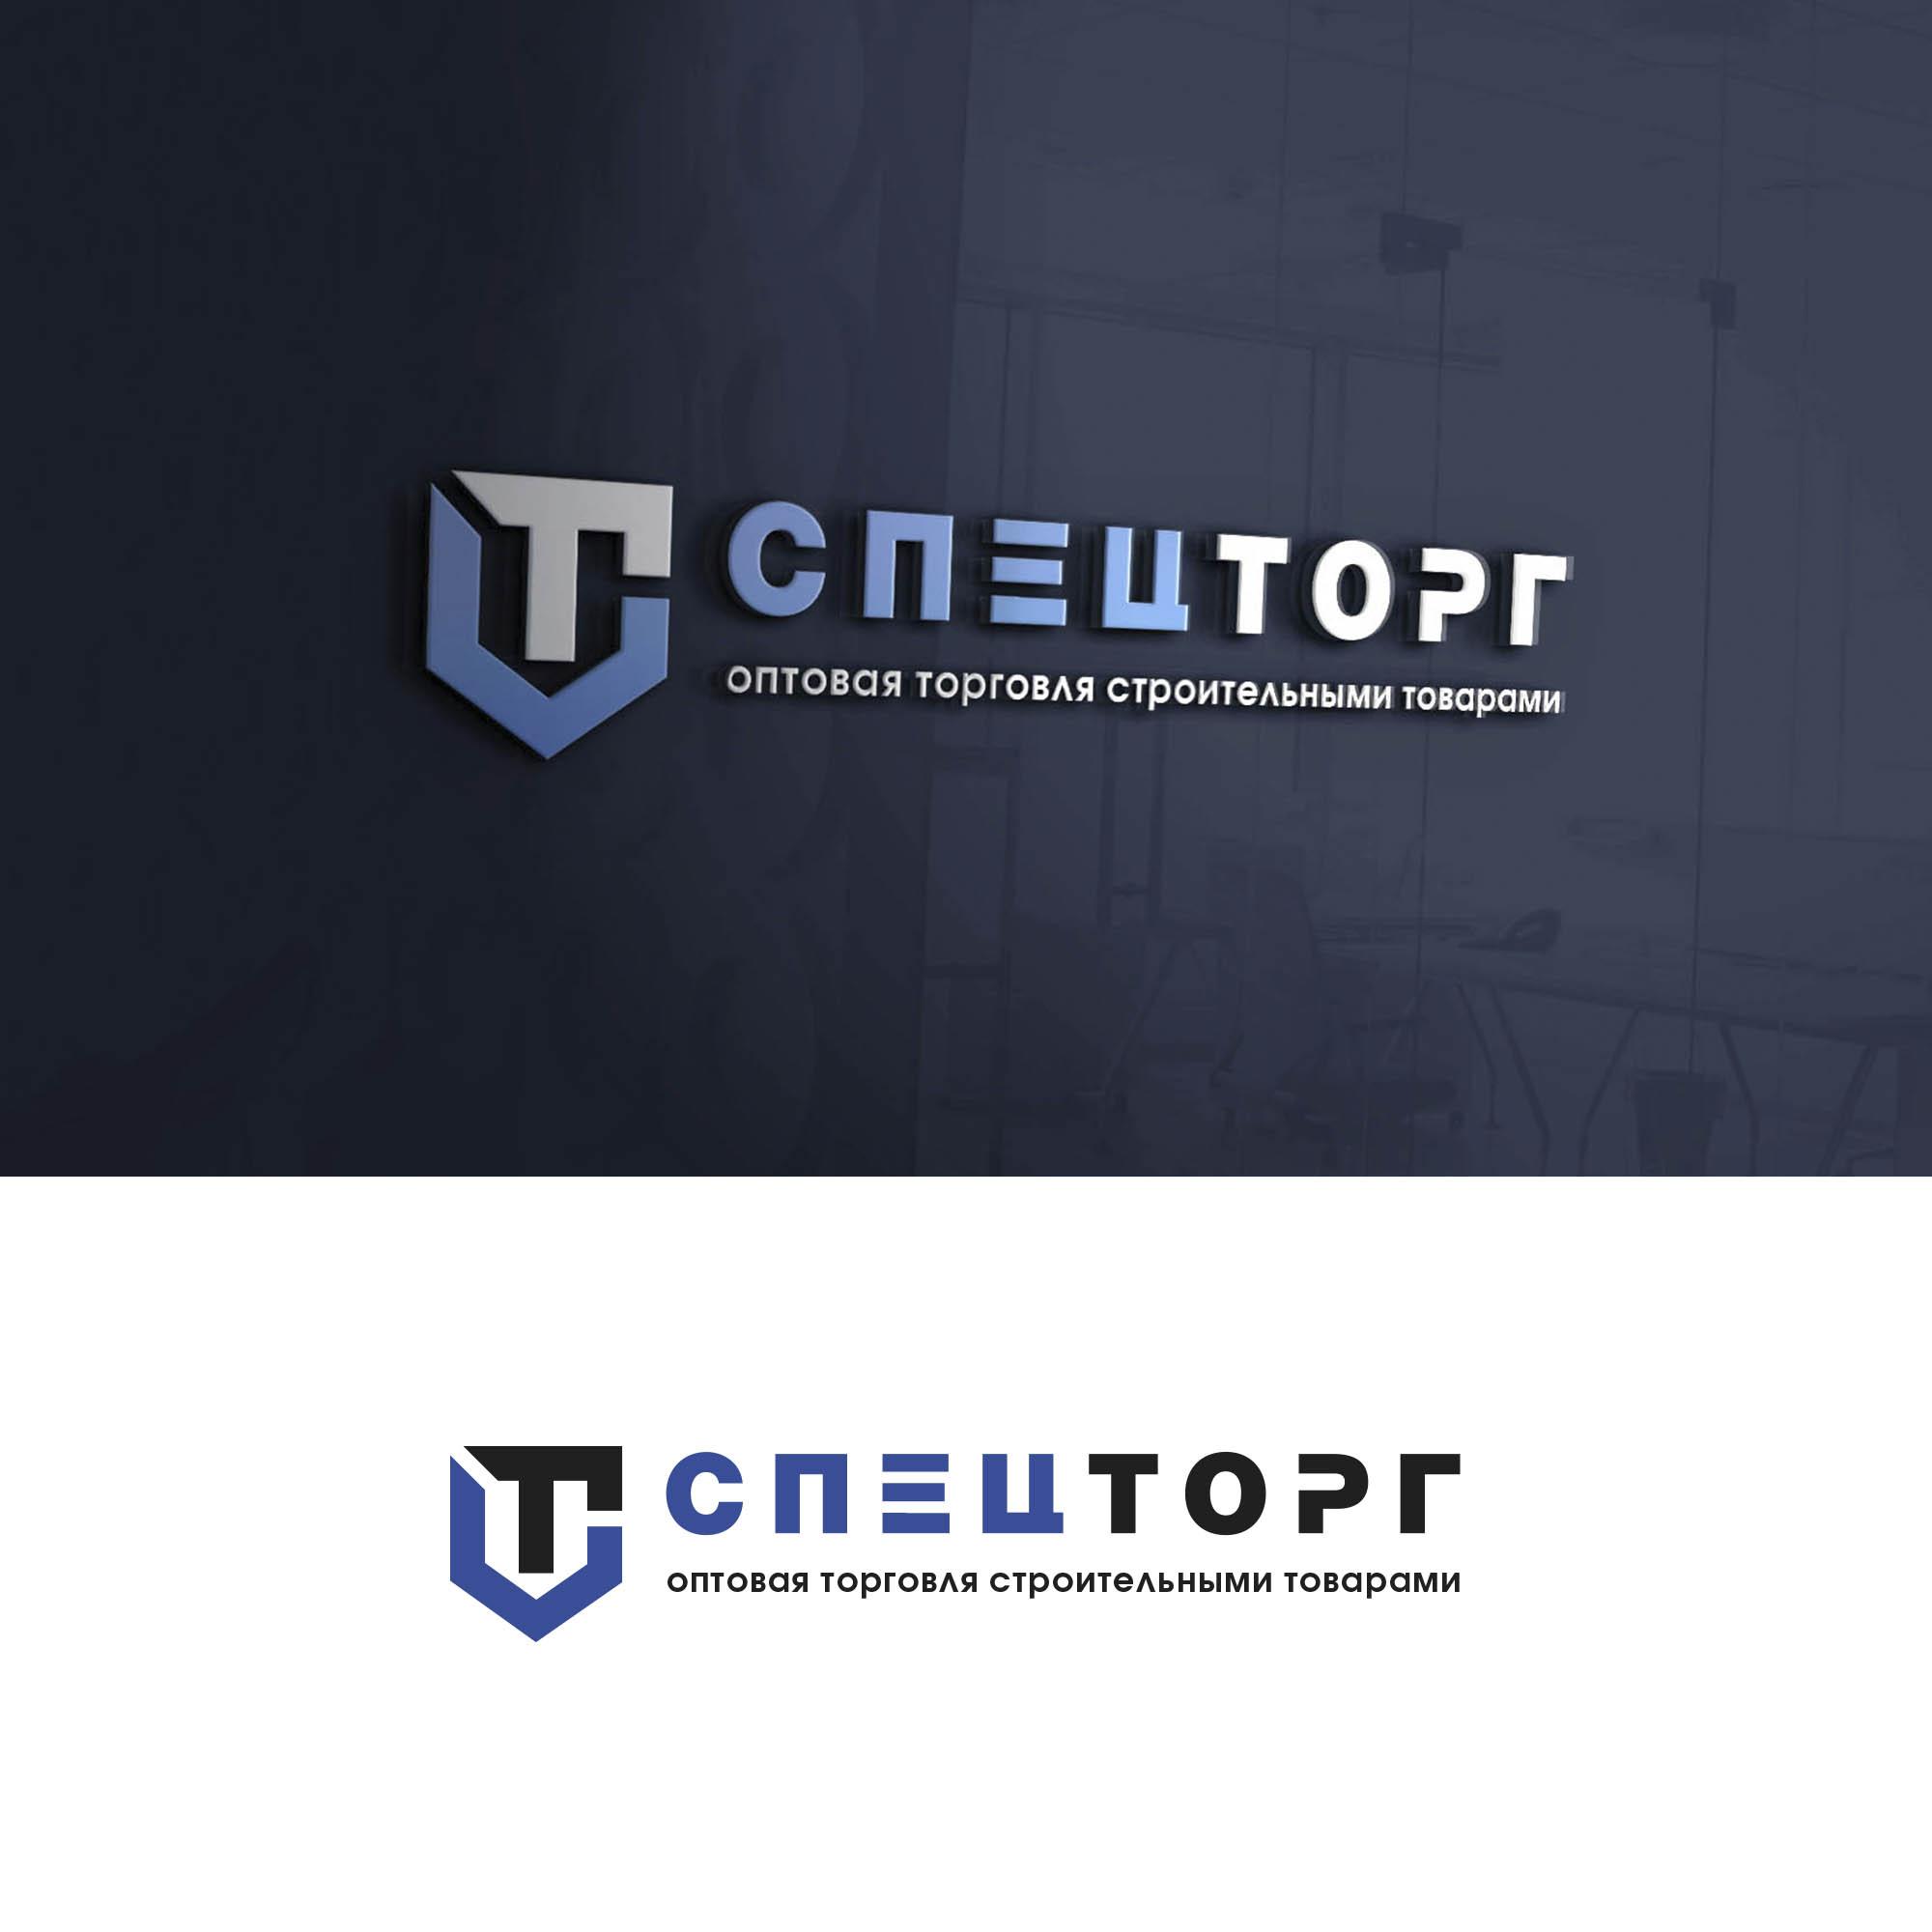 Разработать дизайн  логотипа компании фото f_7995dc296d048f25.jpg